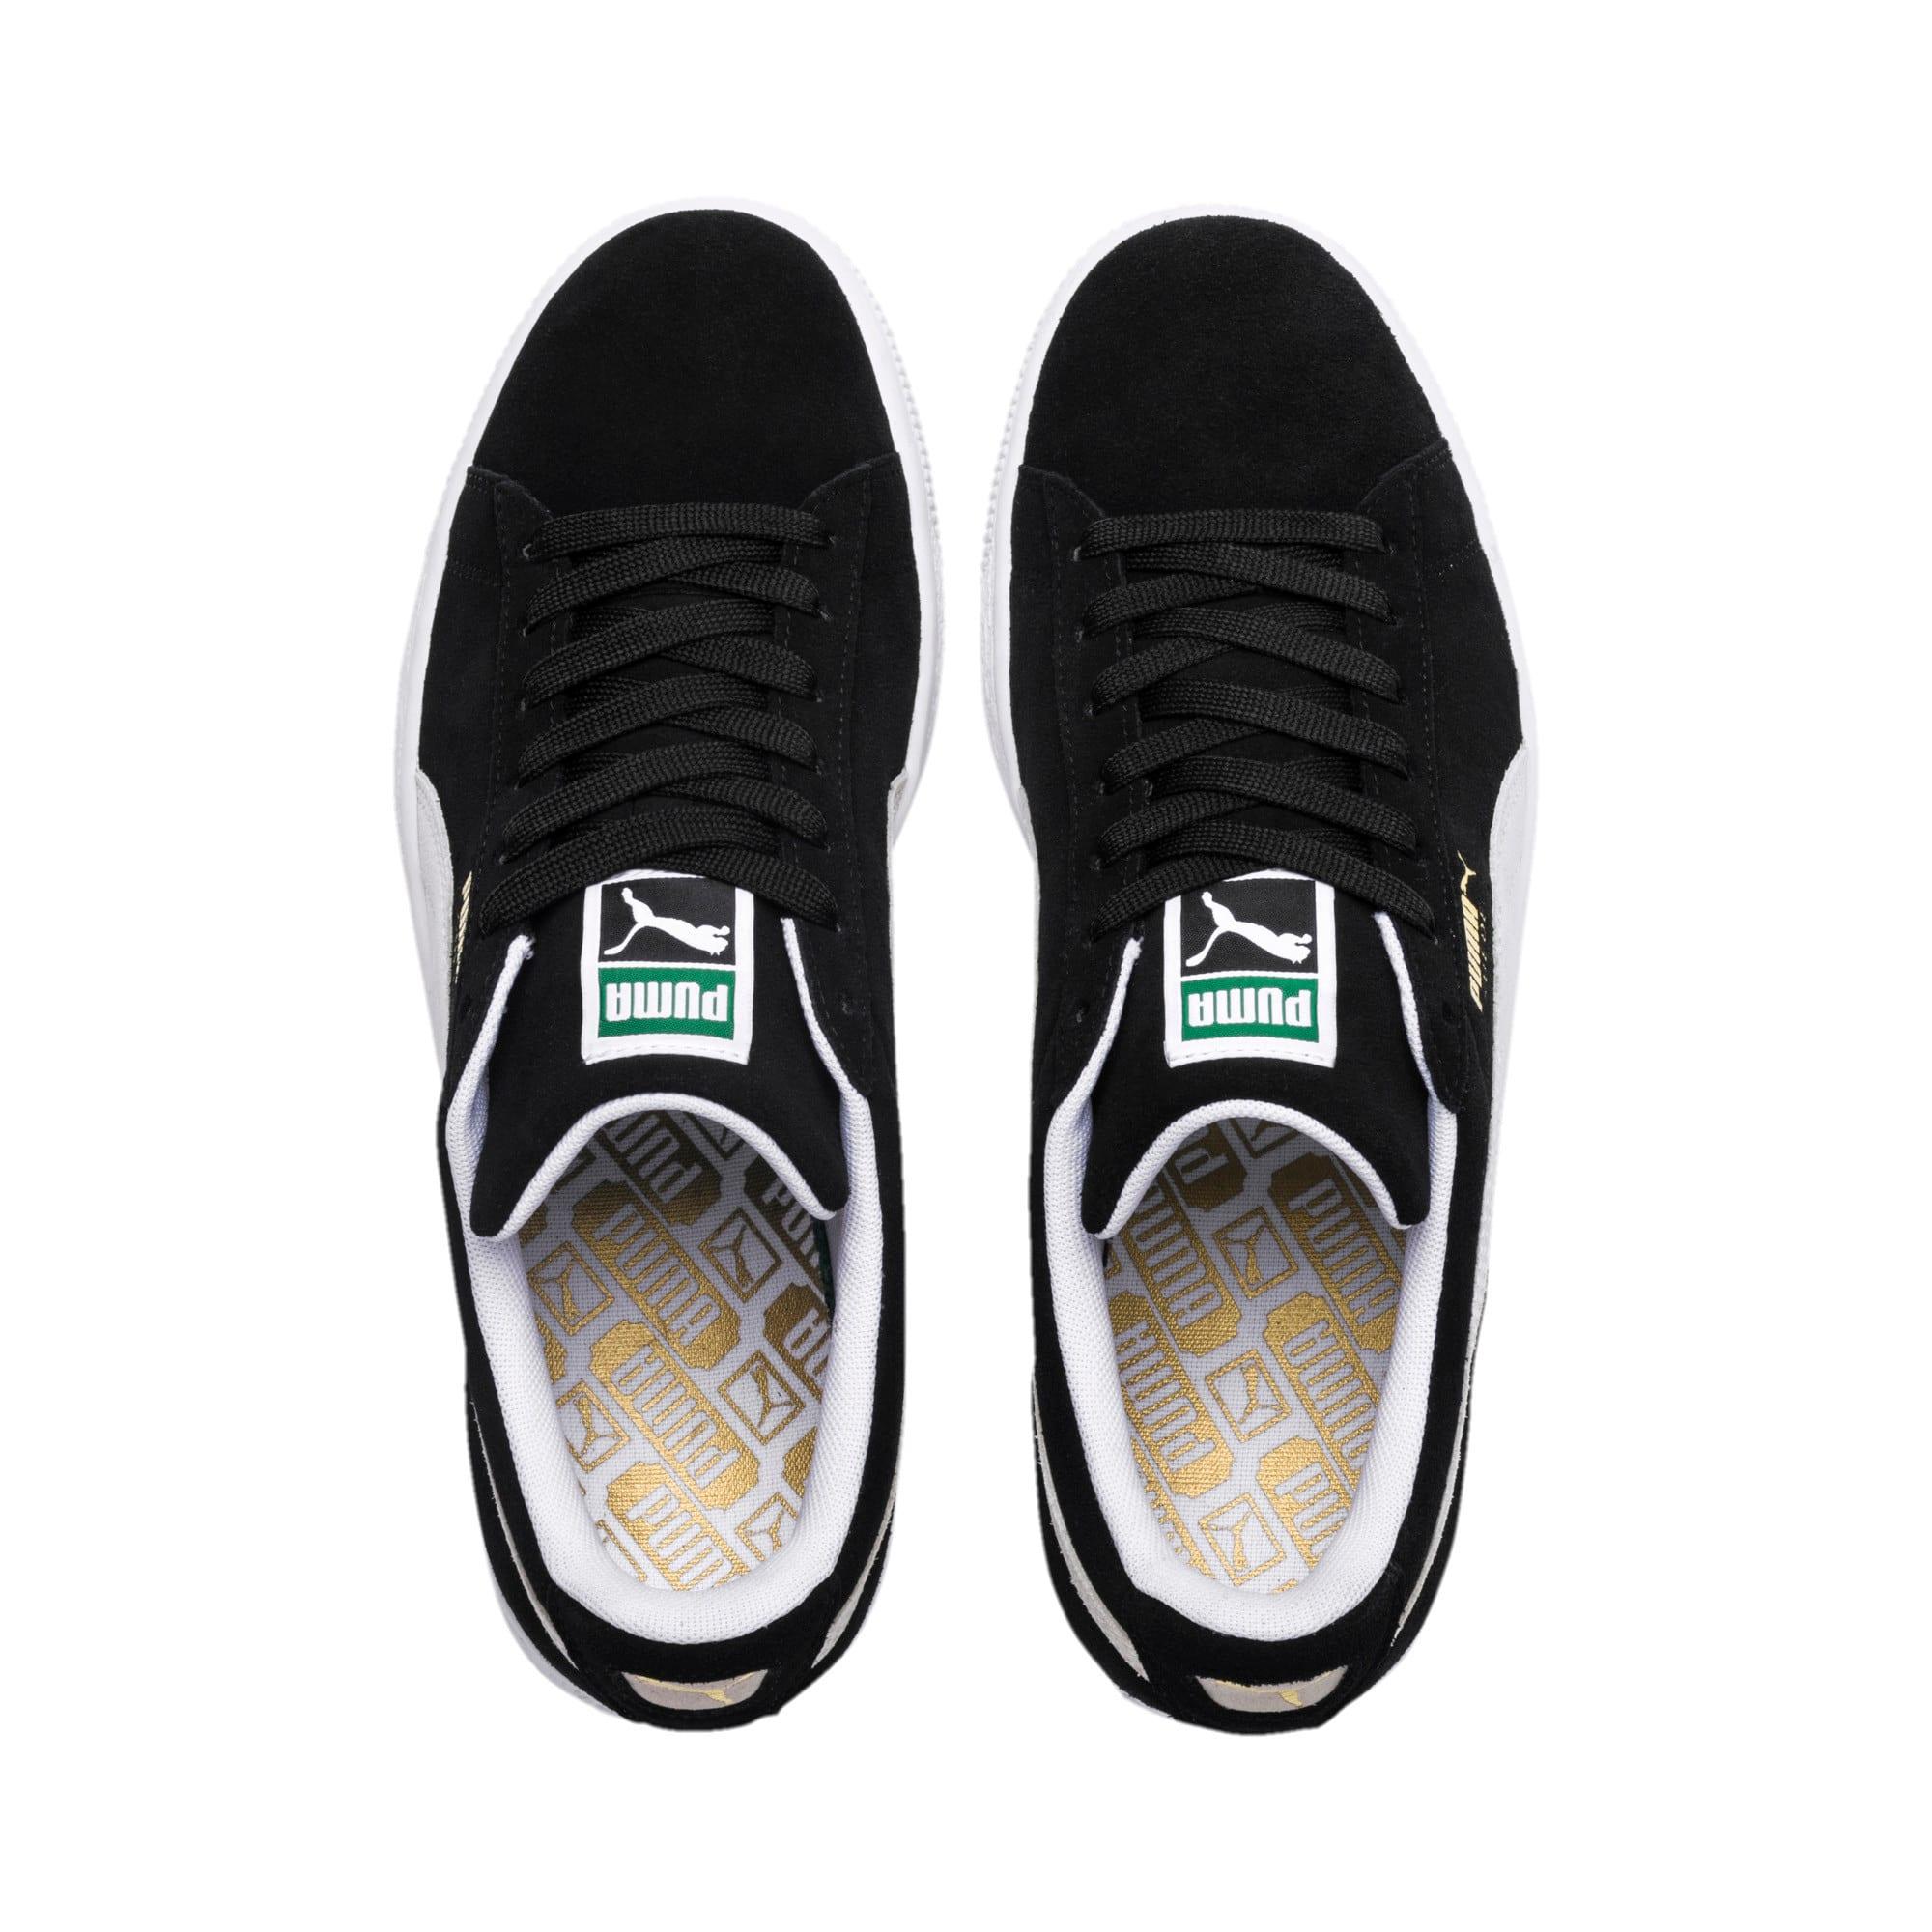 Thumbnail 6 of Suede Classic Women's Sneakers, black, medium